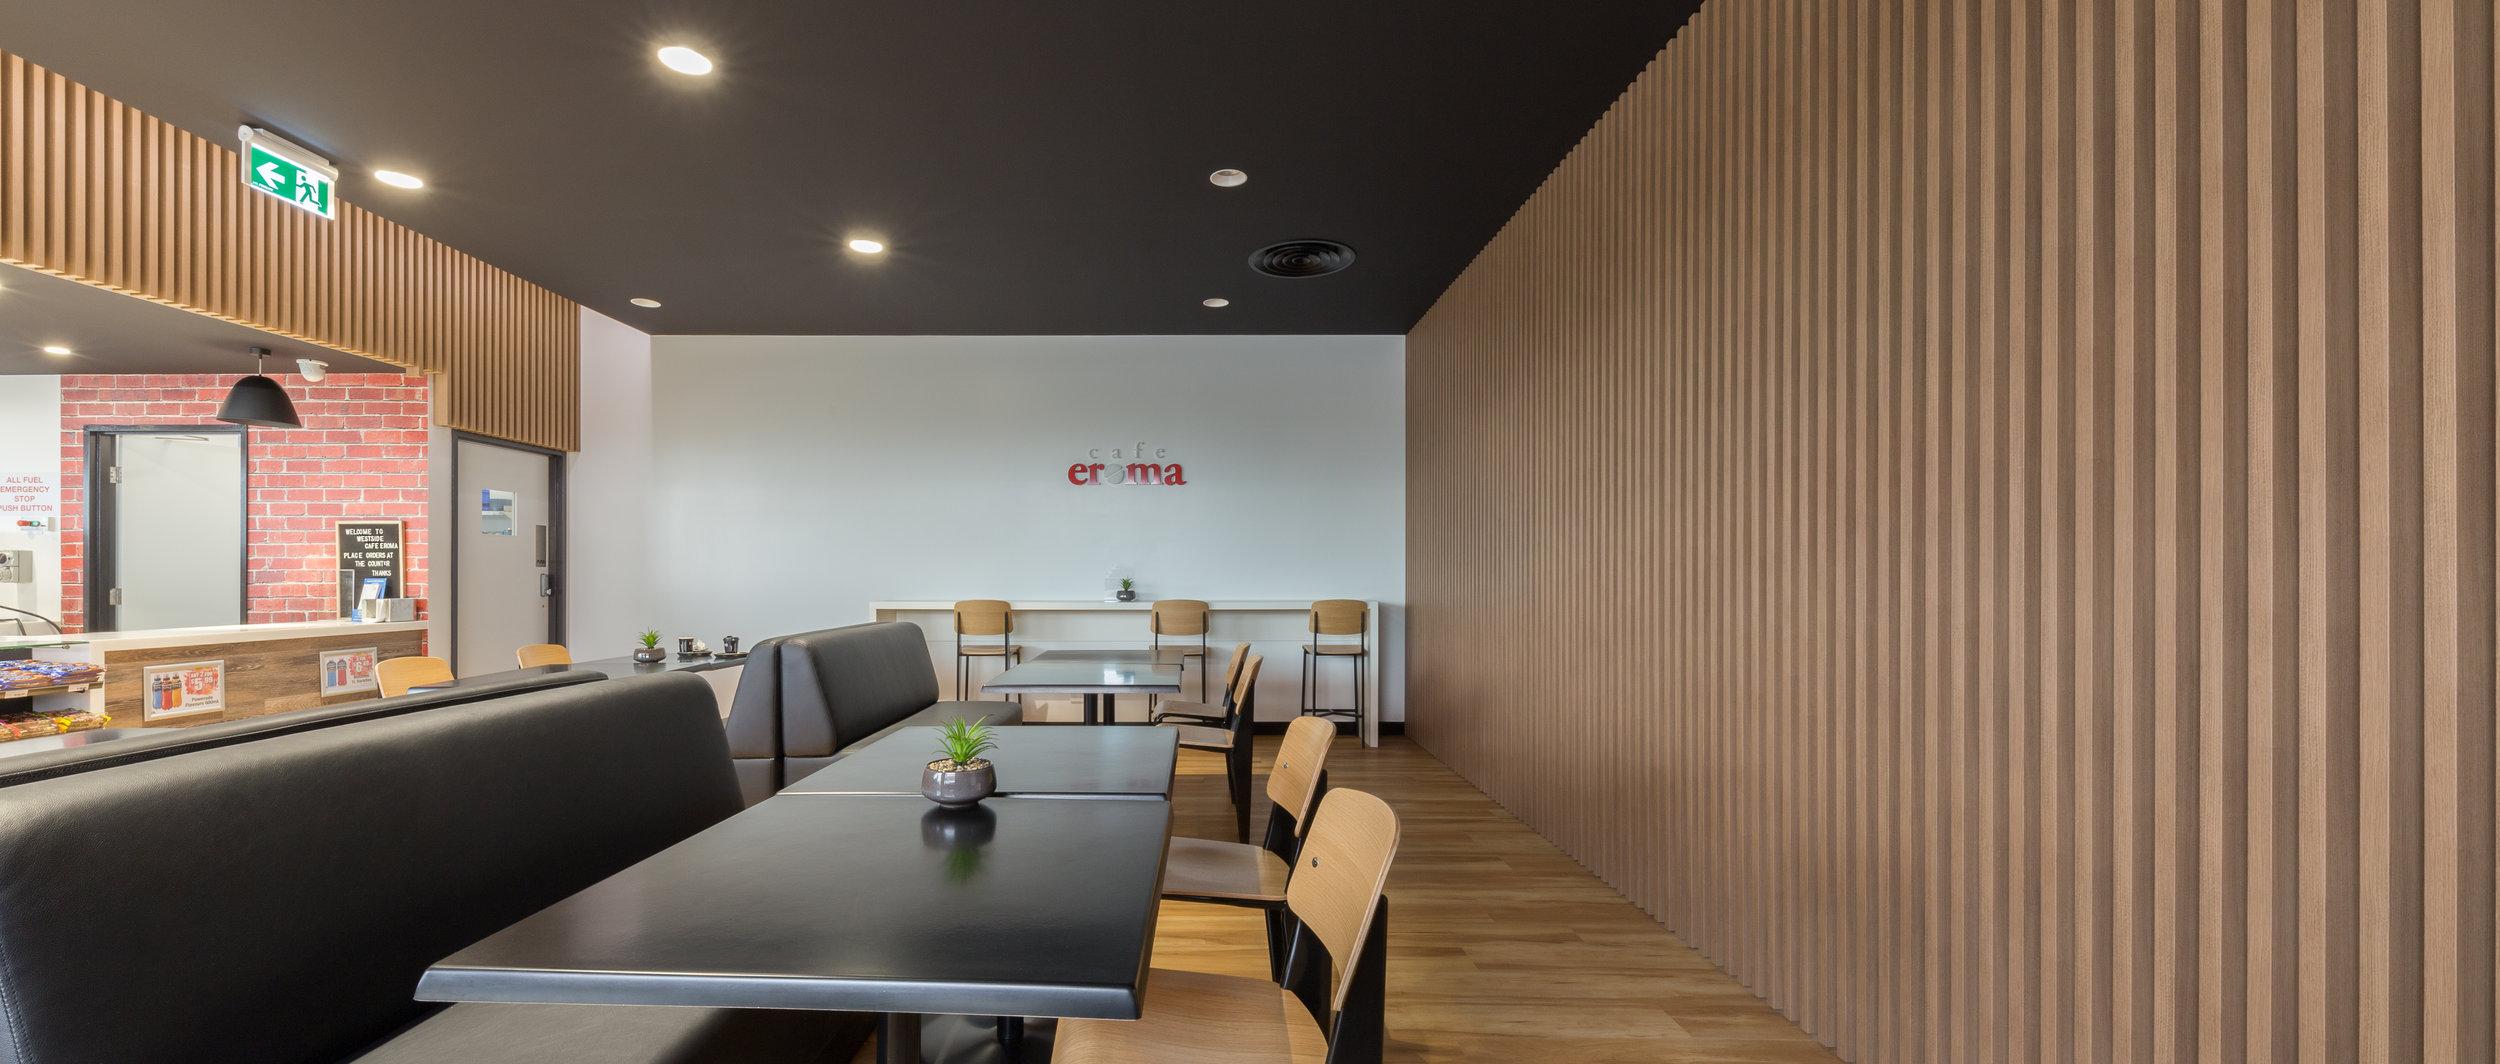 Westside Petroleum - Sebastapol VIC Ever Art Wood® battens - Kabebari 30x85 in Kuri Masame